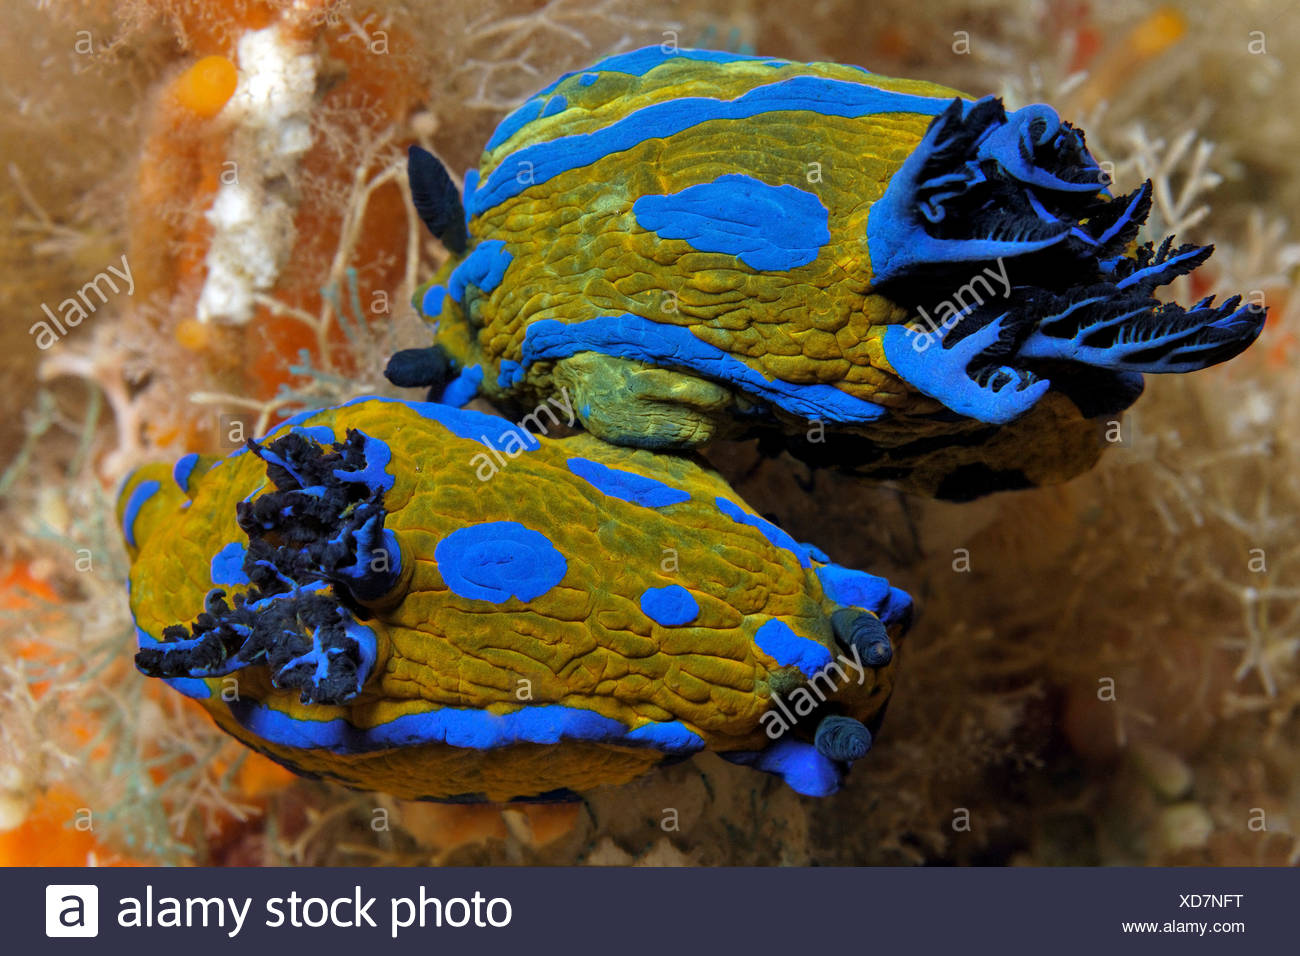 Two sea slugs (Tambja verconis) mating, North Island, New Zealand, Pacific Ocean, underwater shot - Stock Image